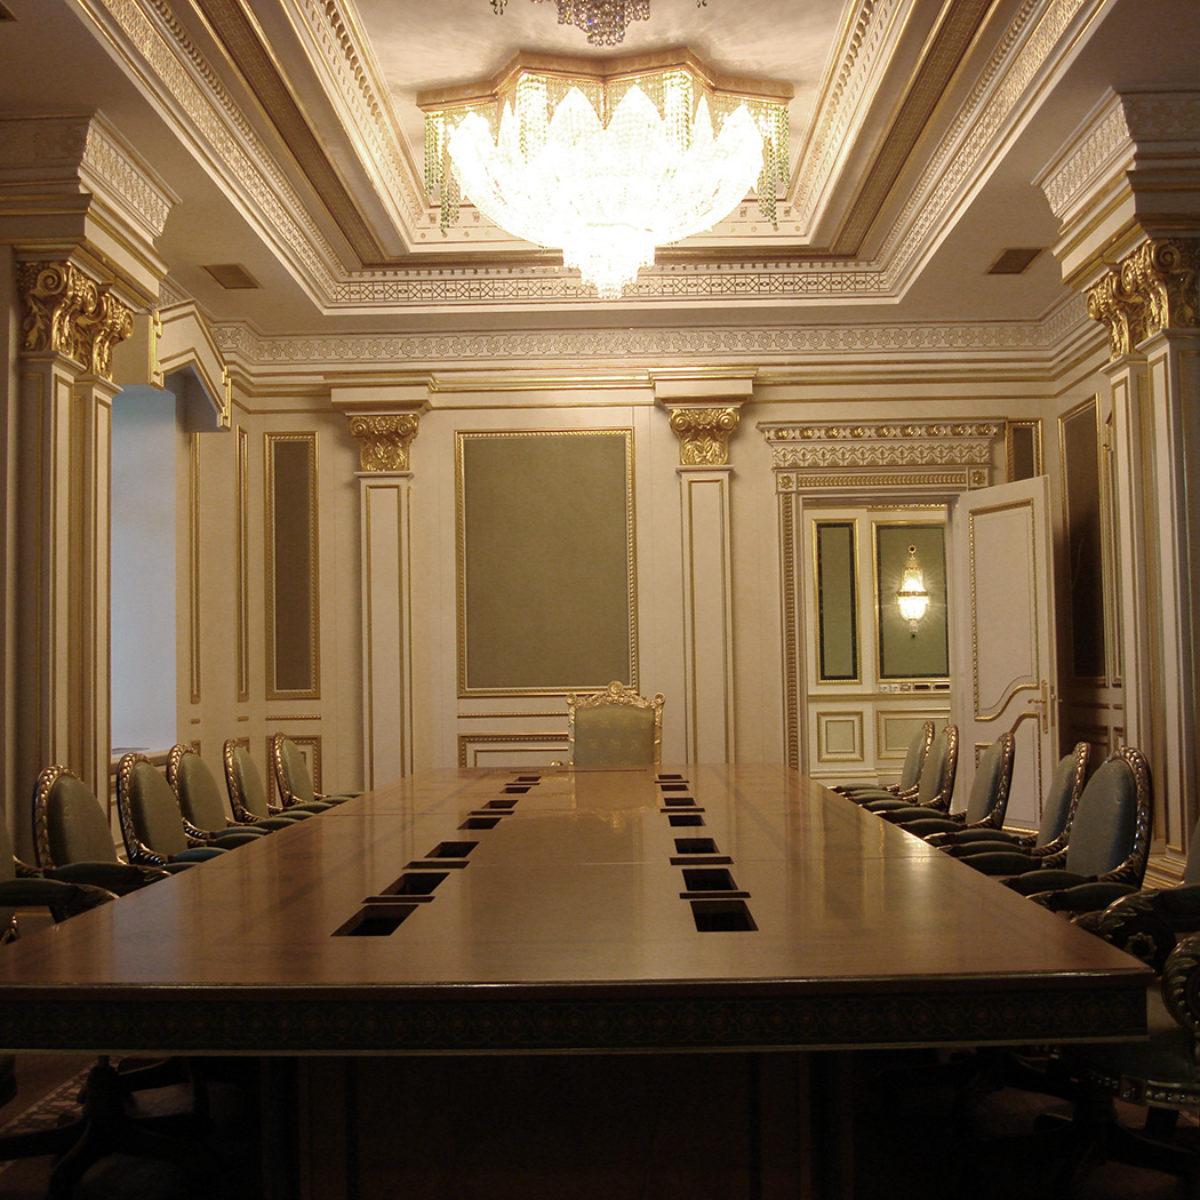 Türkmenistan Meclisi